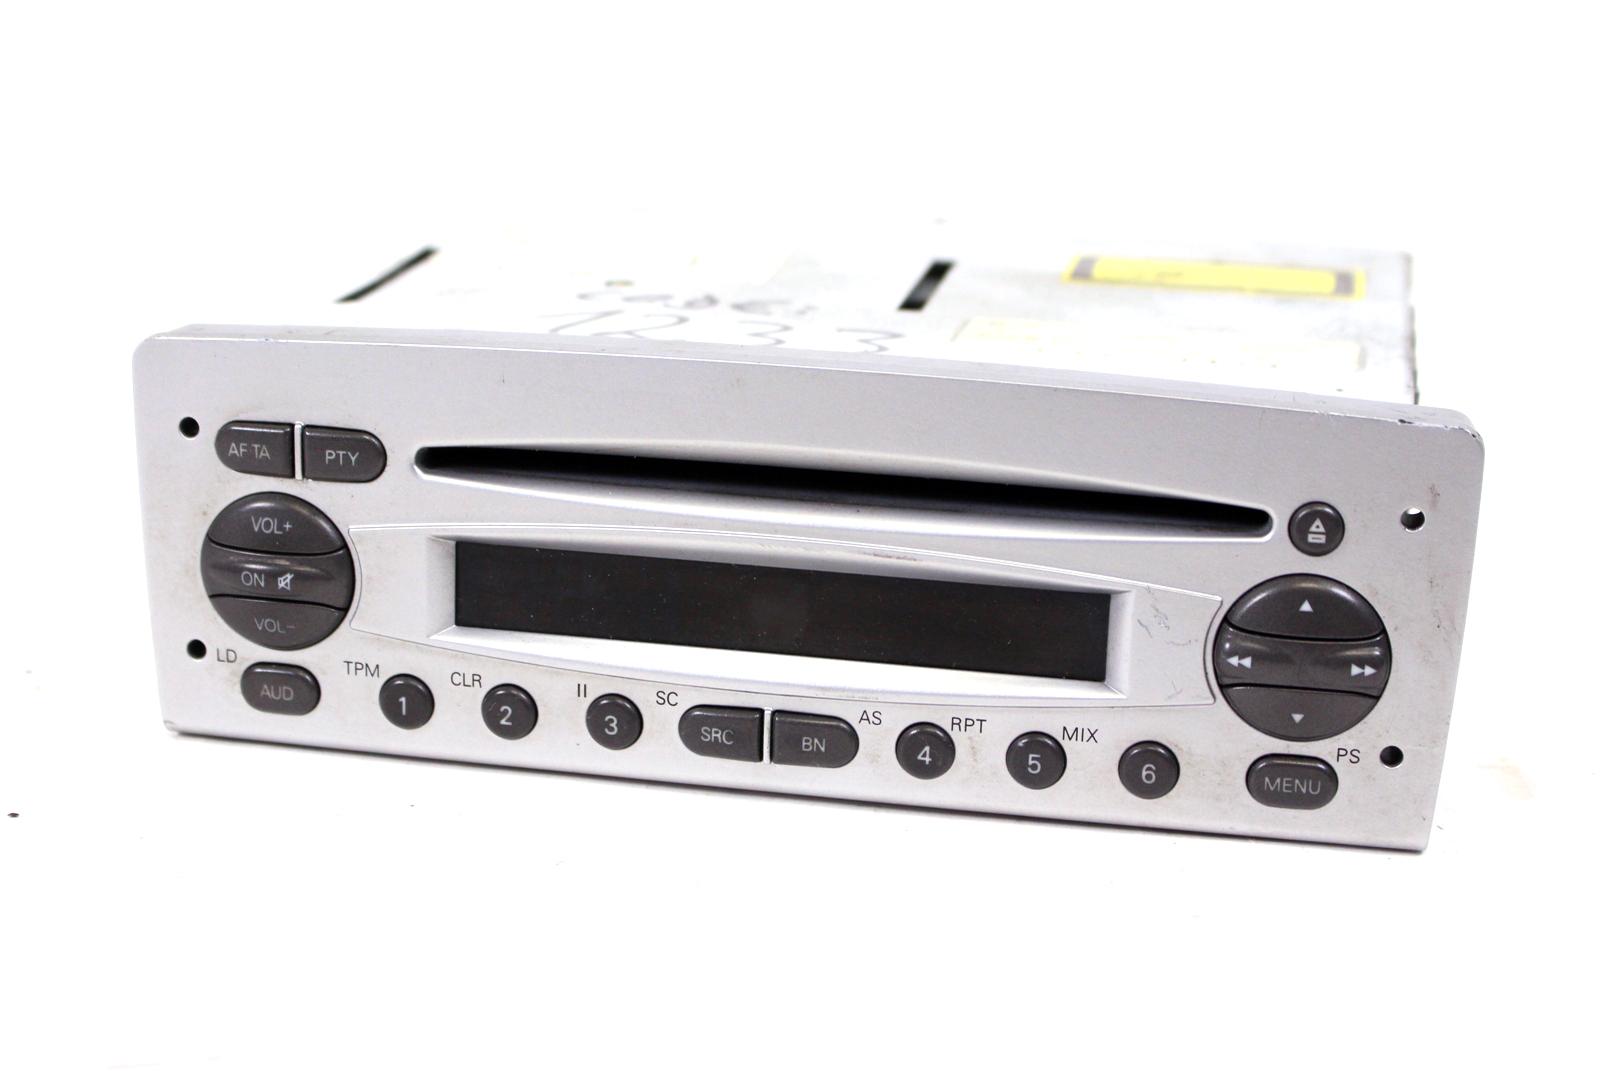 blaupunkt autoradio alfa romeo 156 radio high cd player. Black Bedroom Furniture Sets. Home Design Ideas